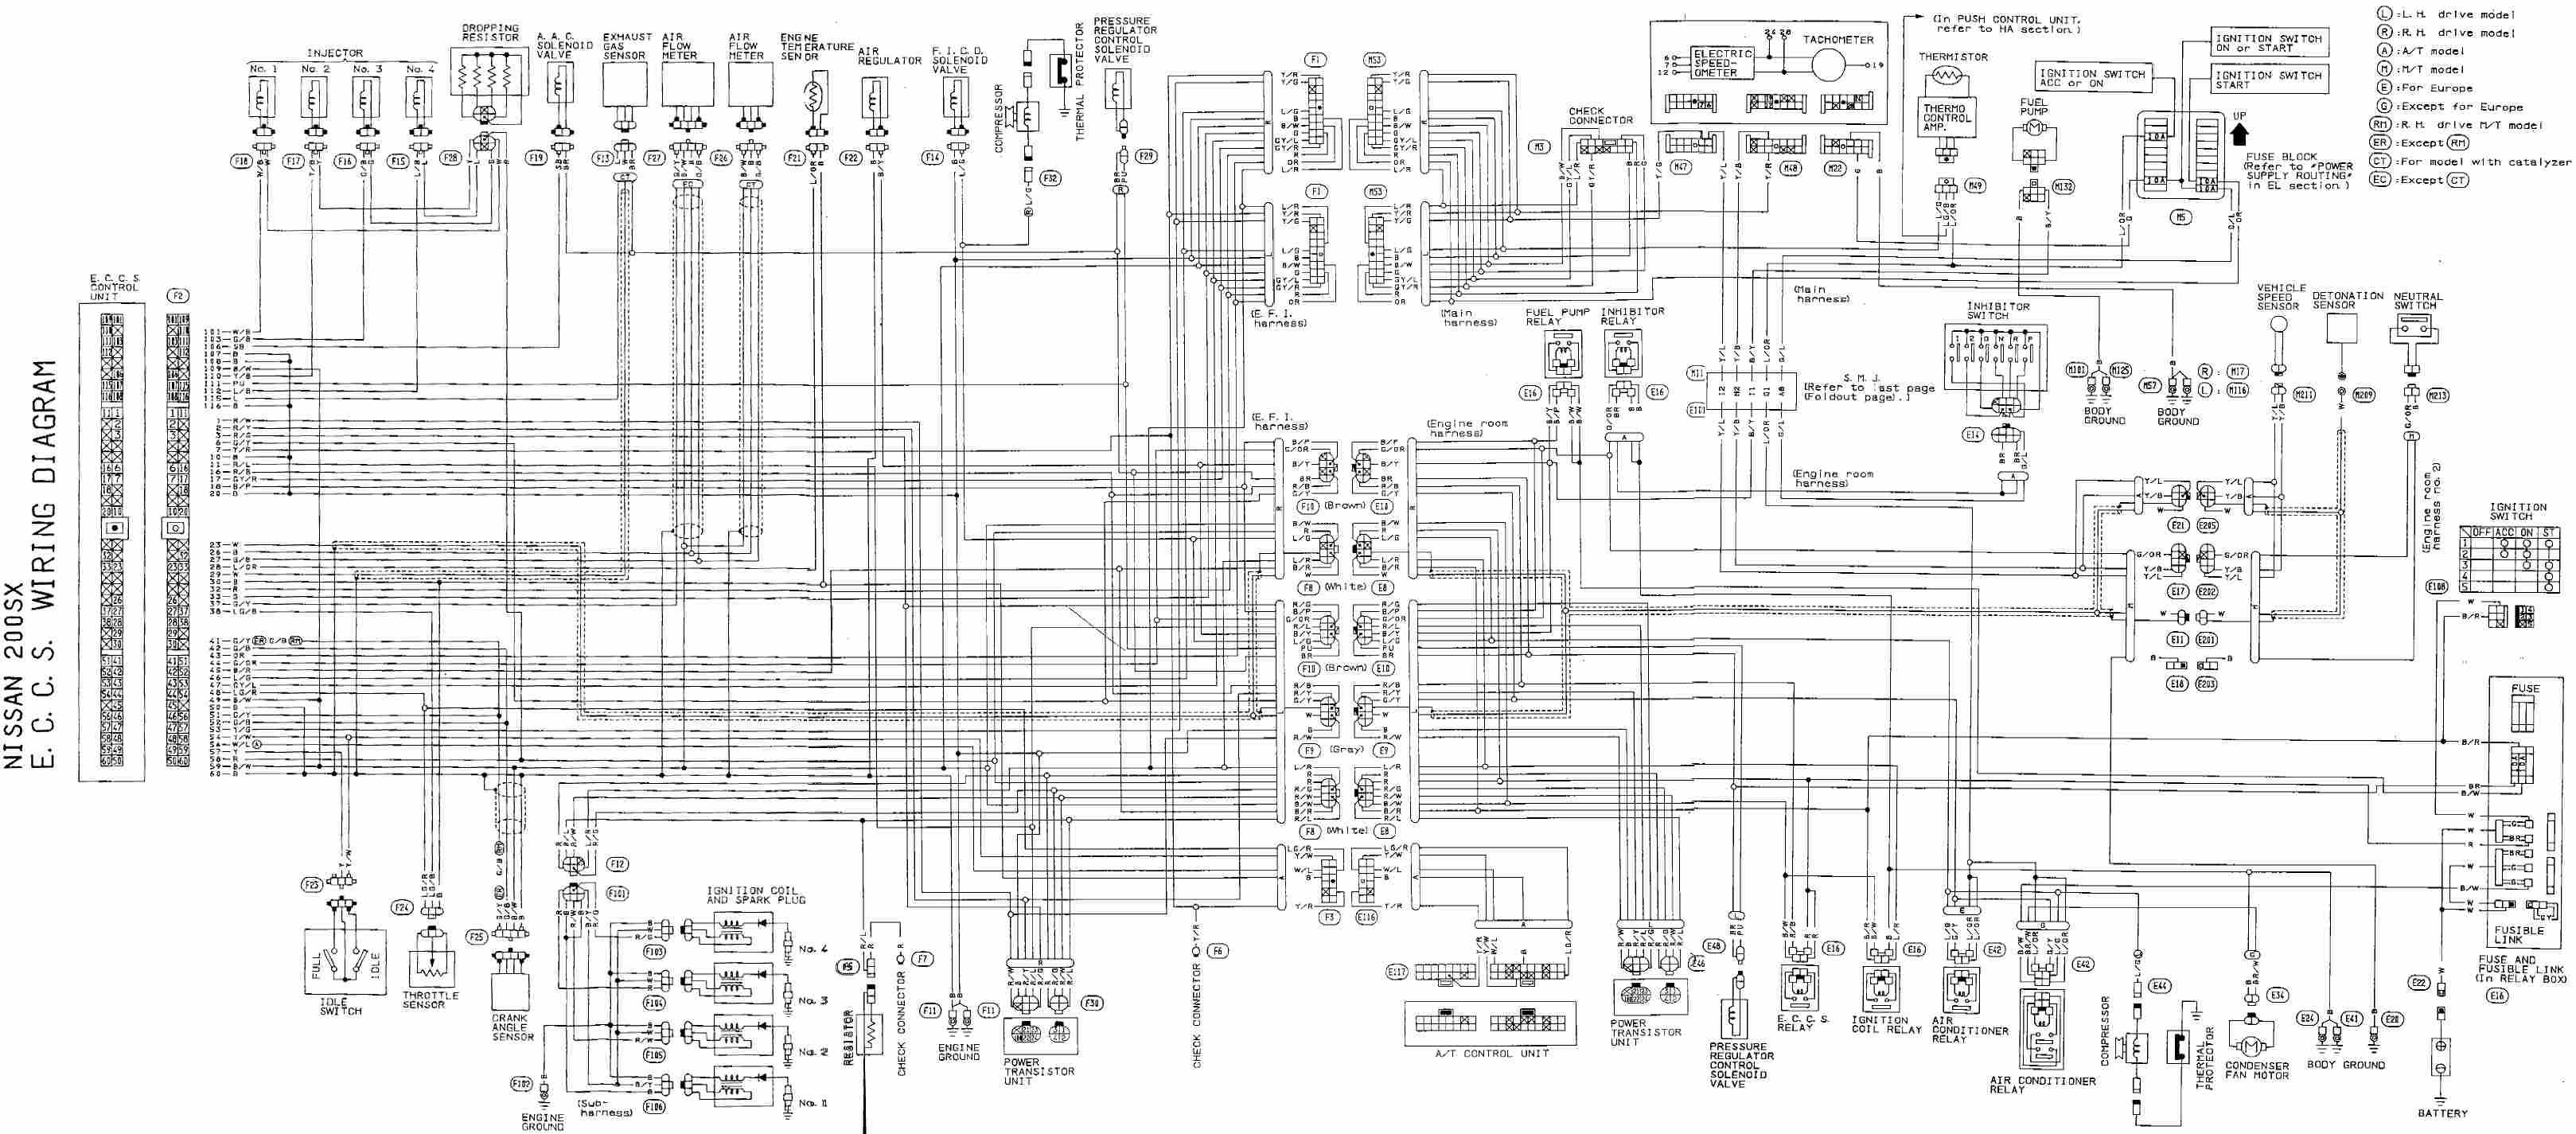 hight resolution of 2001 nissan xterra radio diagram starting know about wiring diagram u2022 2002 xterra wiring diagram 2001 nissan xterra car stereo wiring diagram